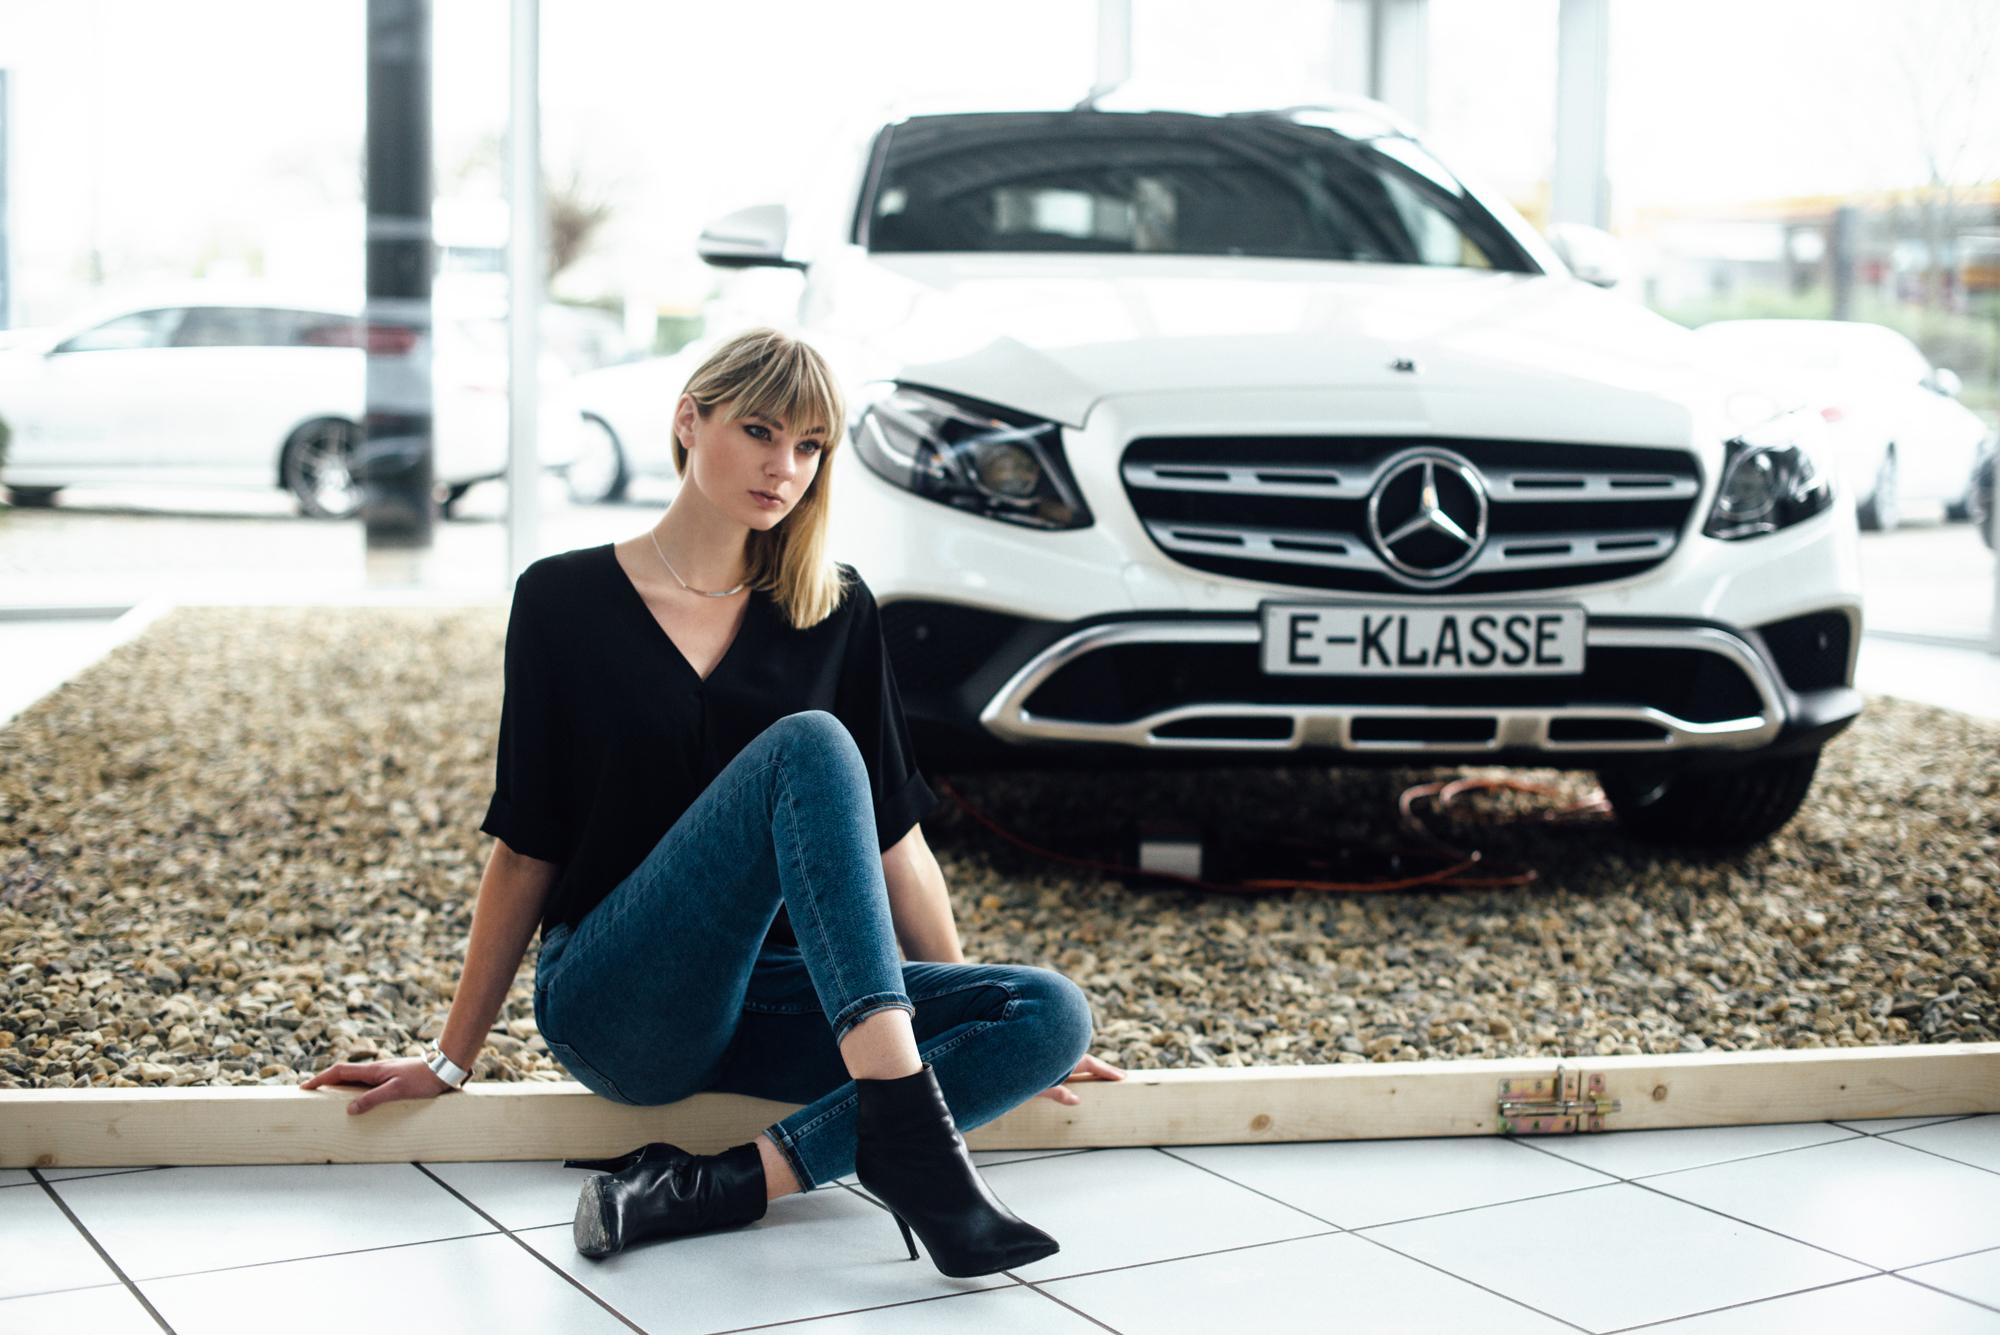 Kiamisu_Mercdes Benz Kassel_Peak_A Klasse_A Klasse Pead edition weiß__